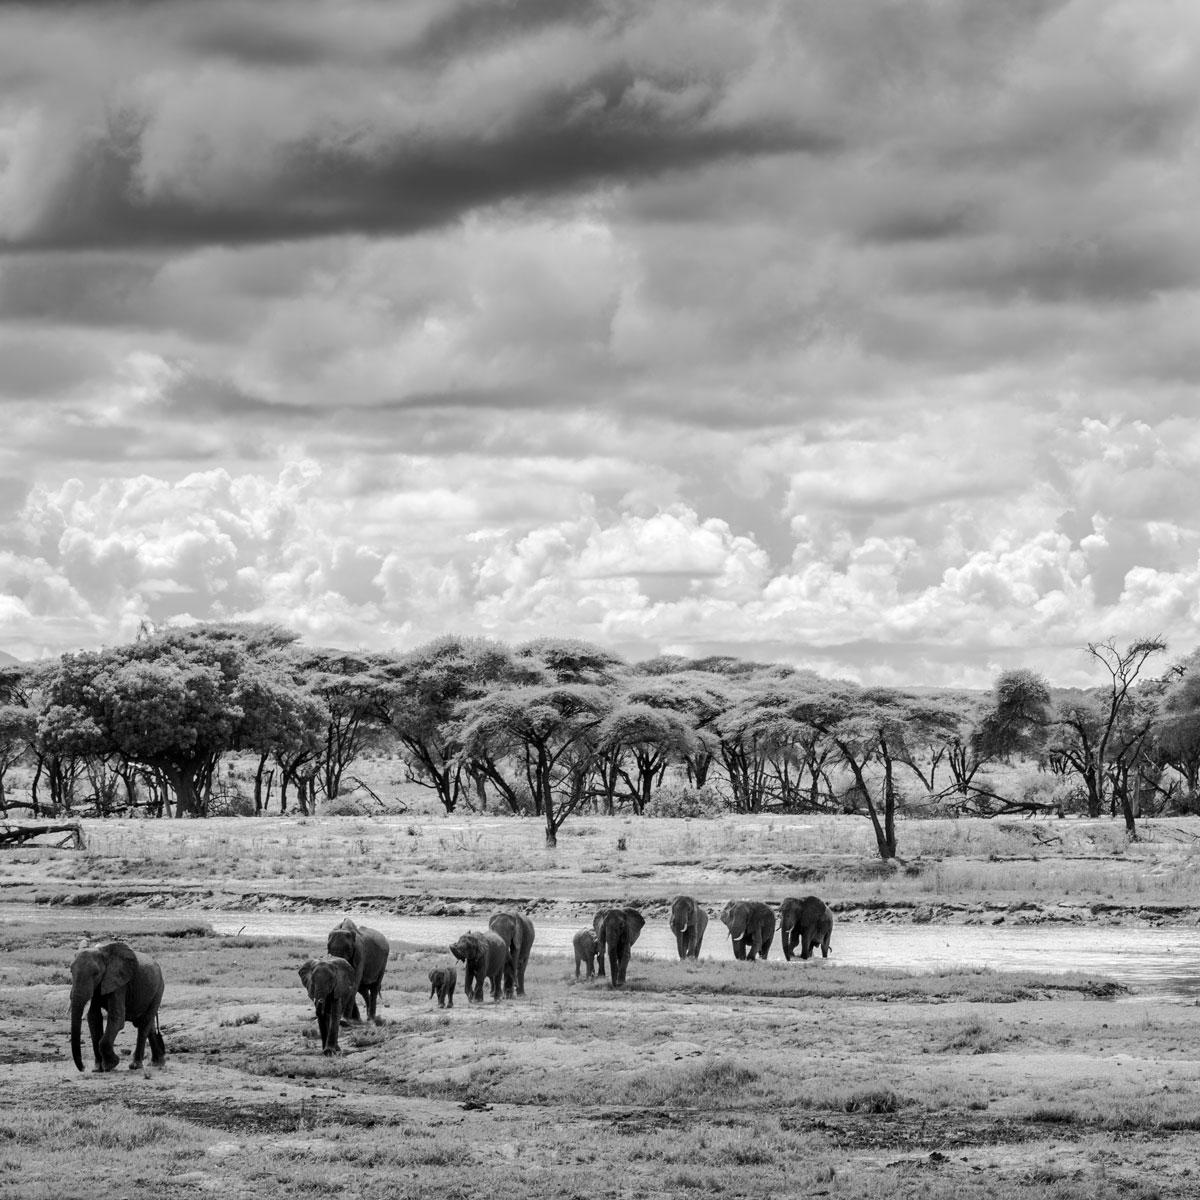 Elephants-Ruaha-photographic-print